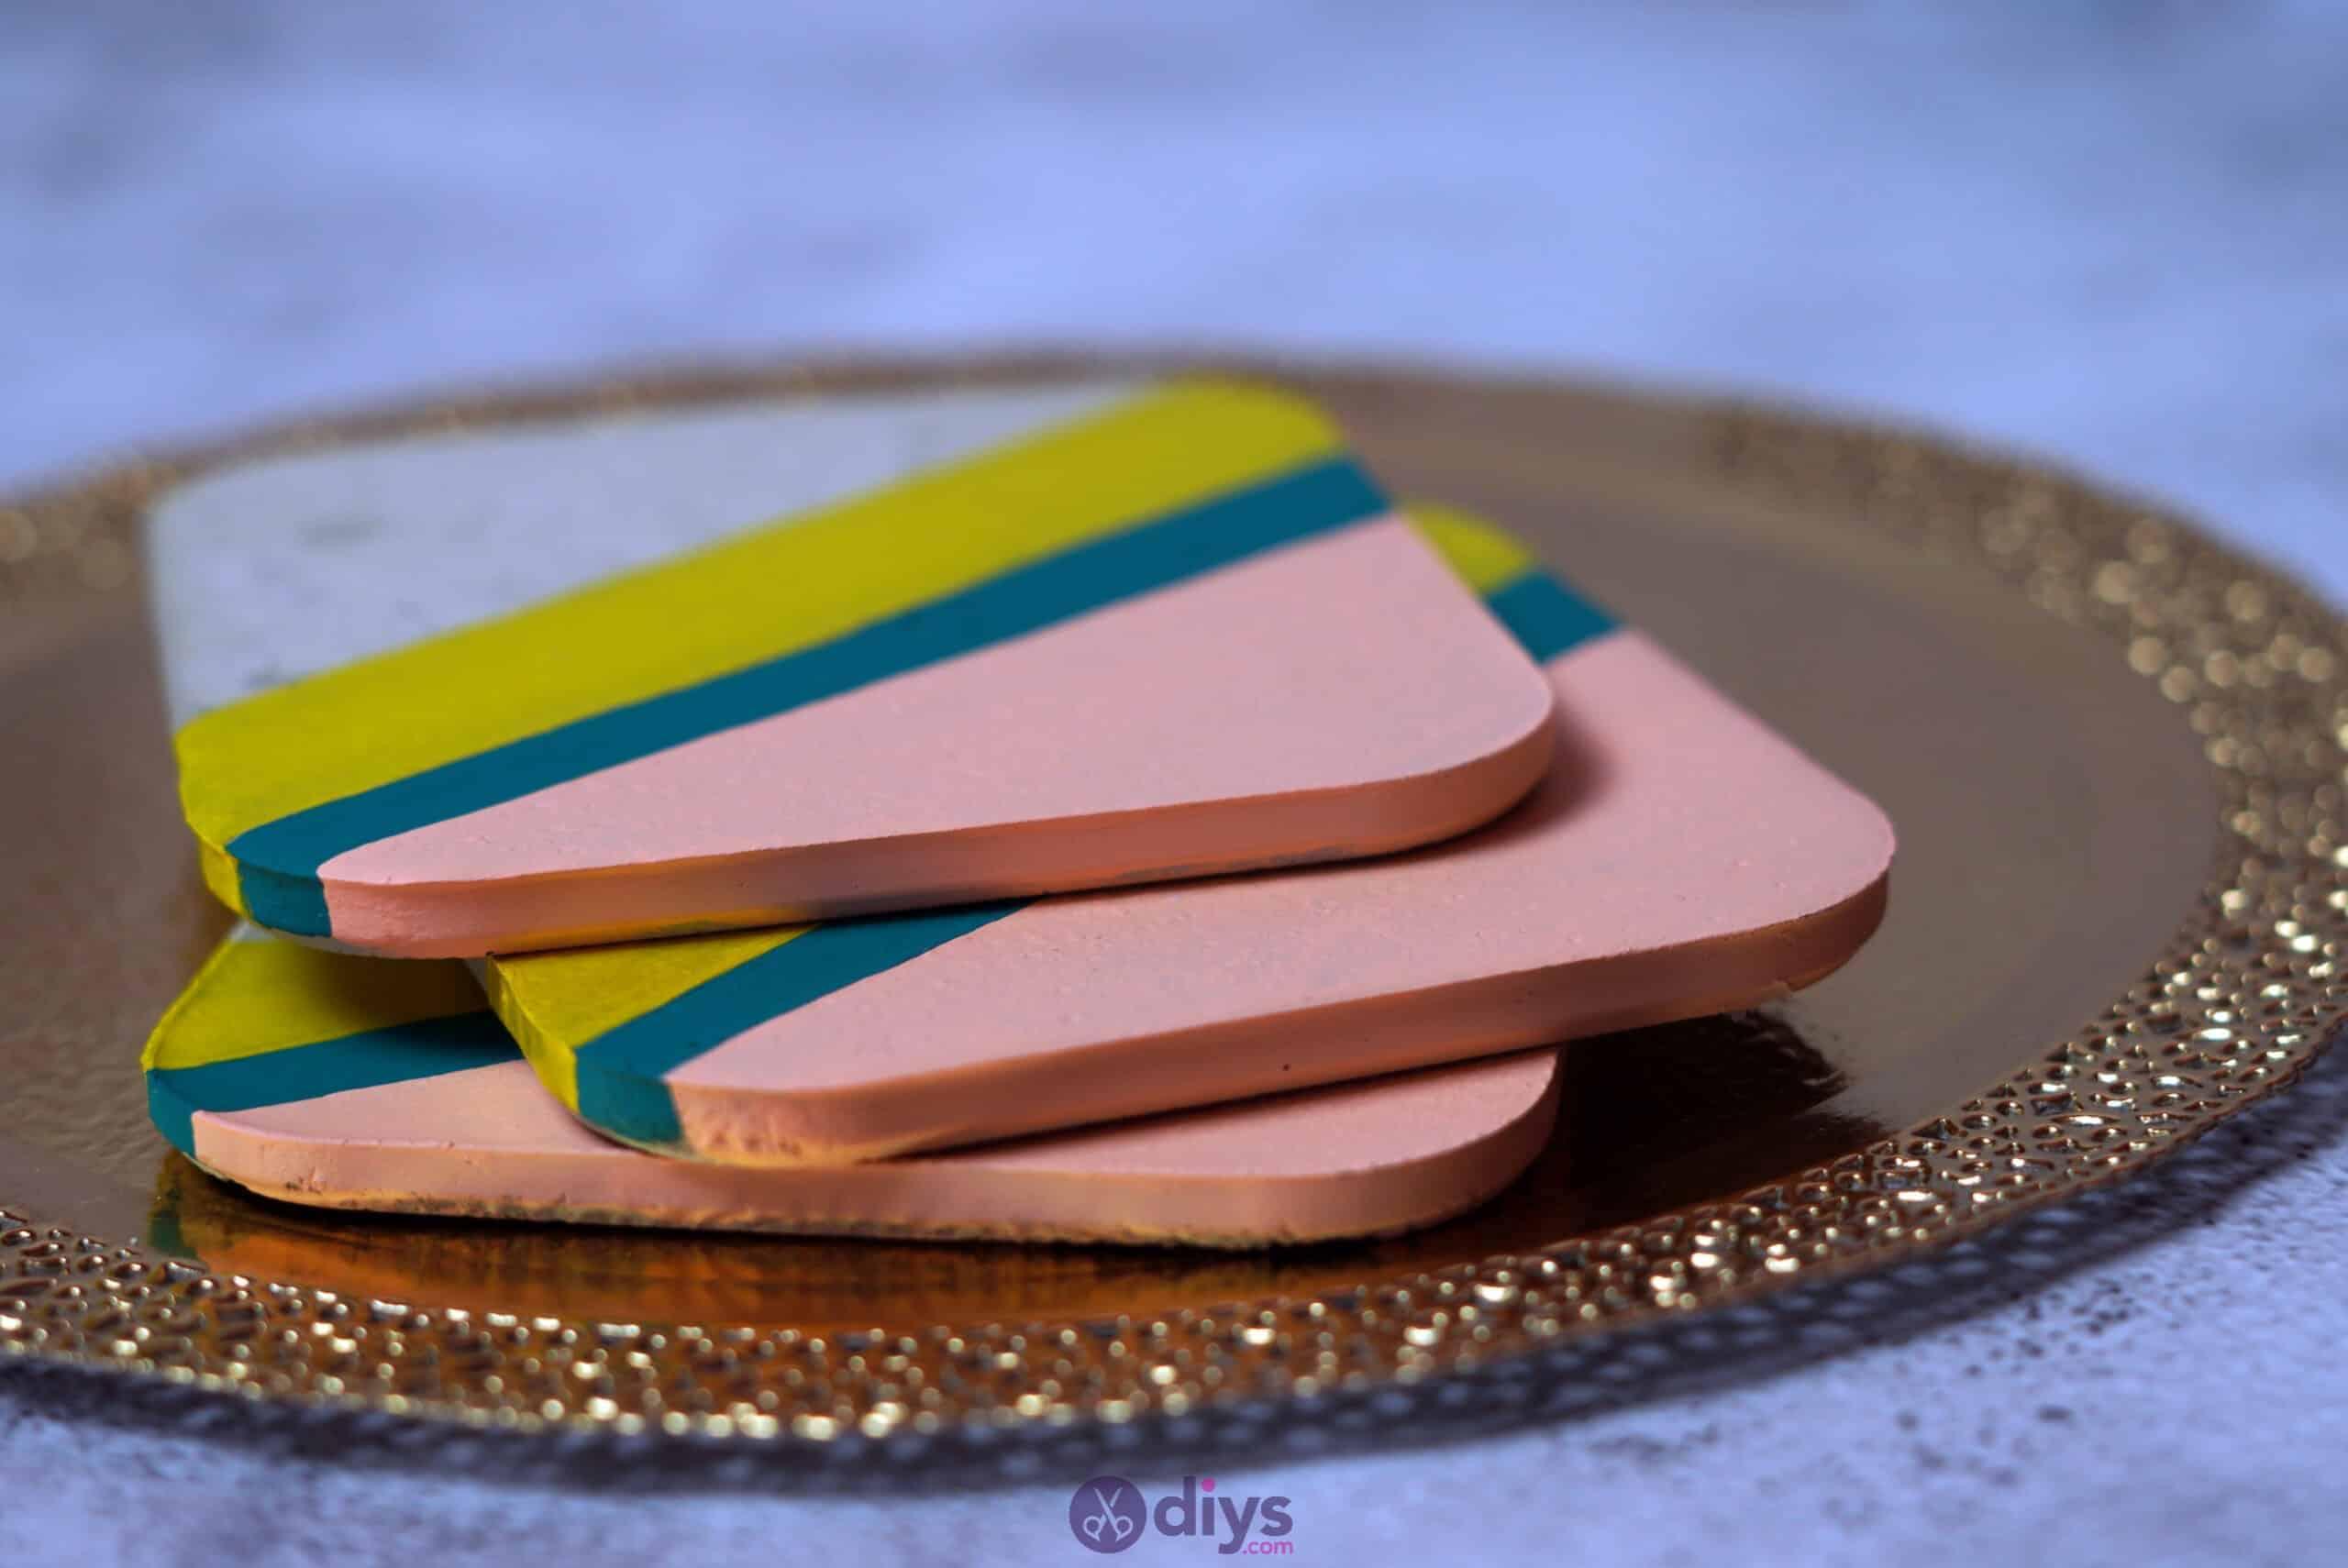 Diy colorful concrete coasters simple idea